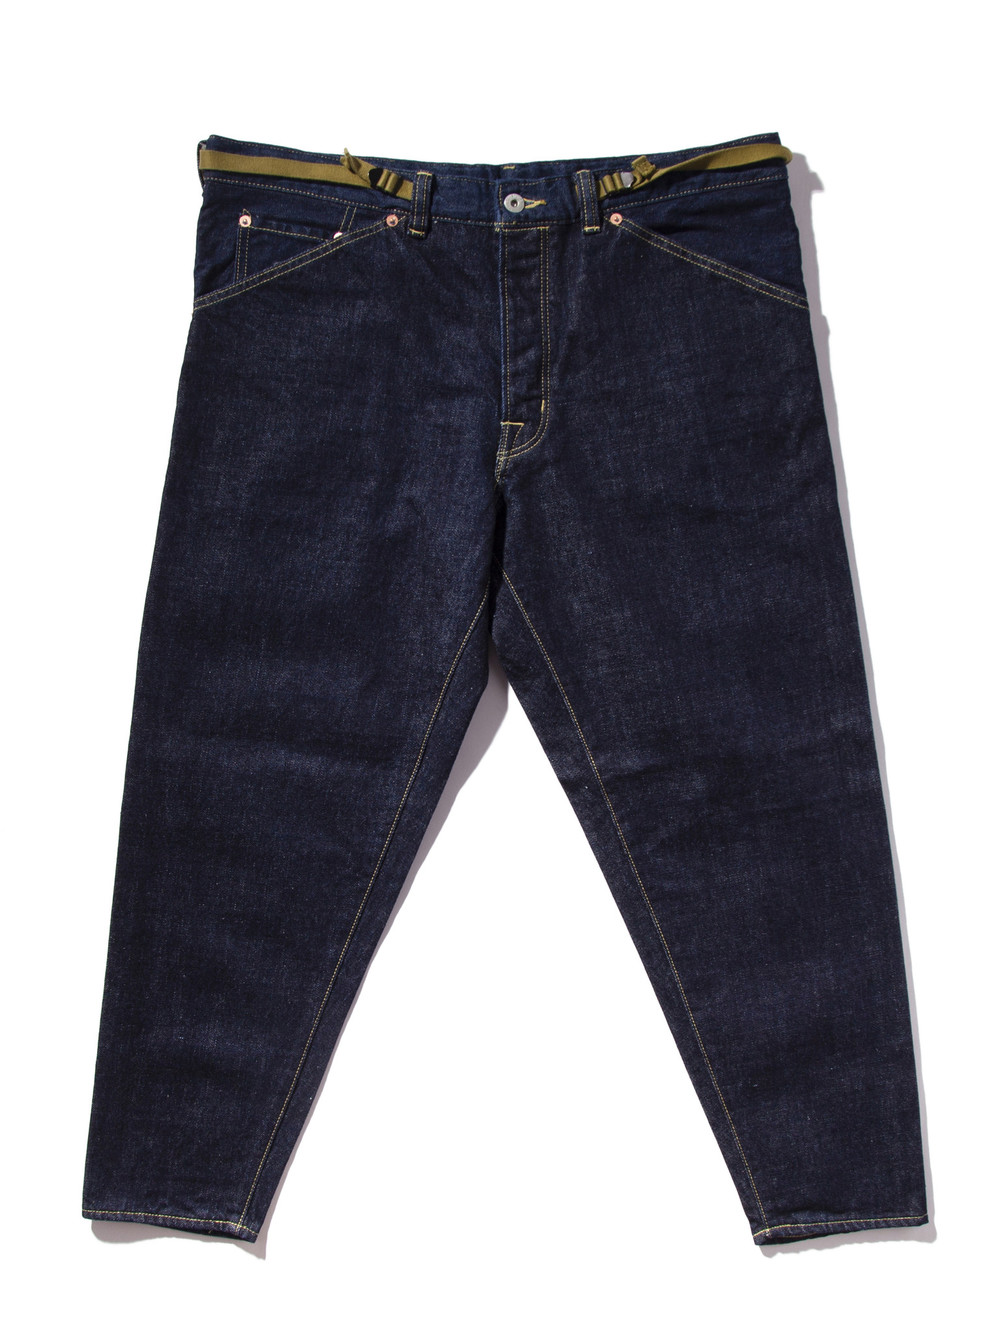 GANRYU_Slouch_Denim_Jeans.jpg